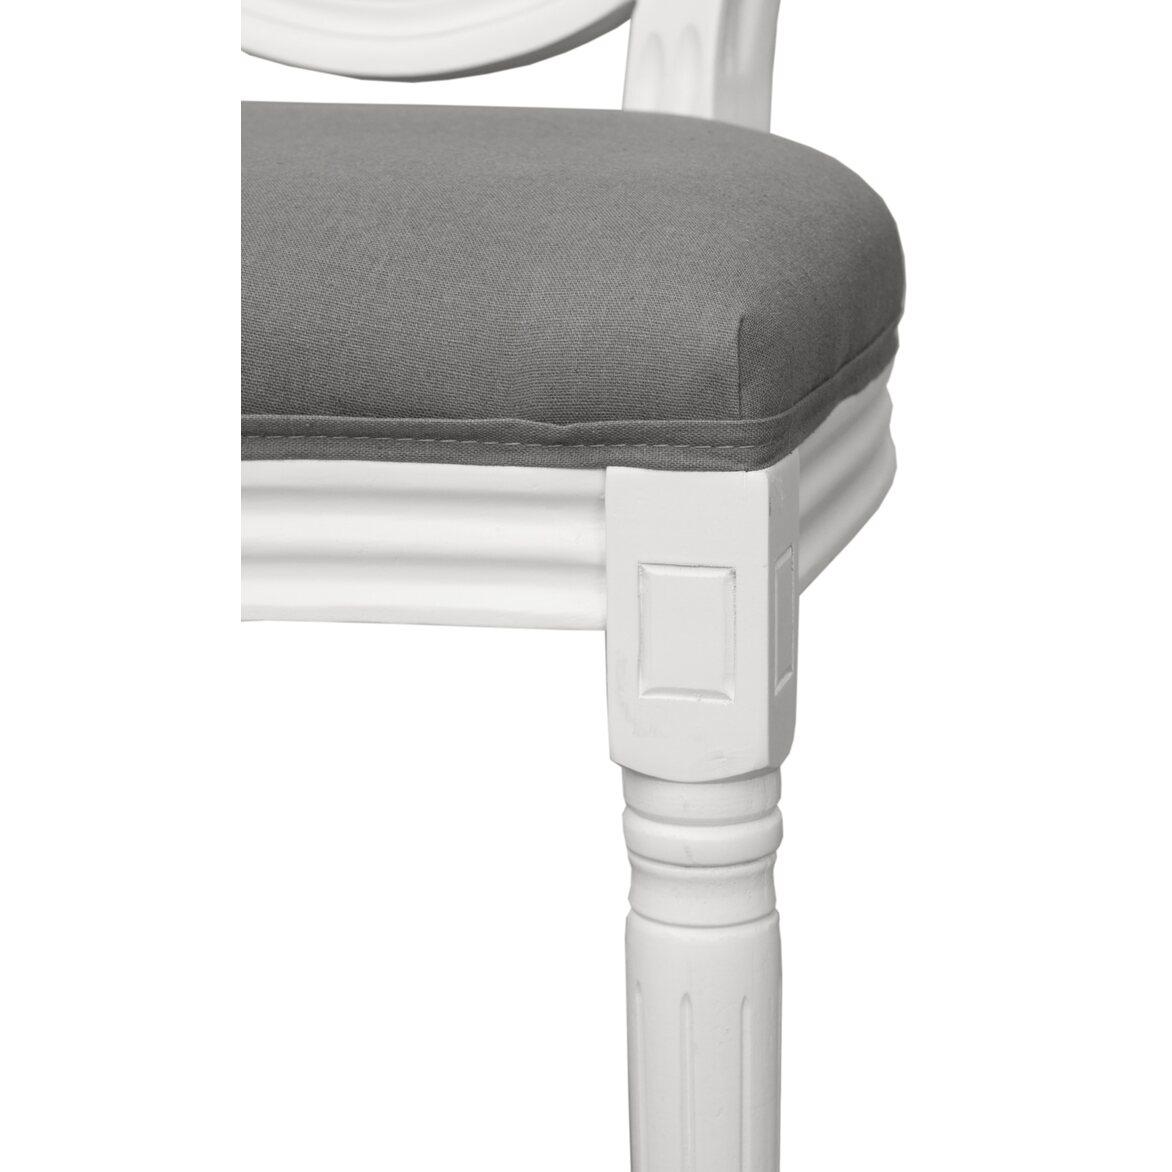 Стул Volker grey+white 5 | Обеденные стулья Kingsby